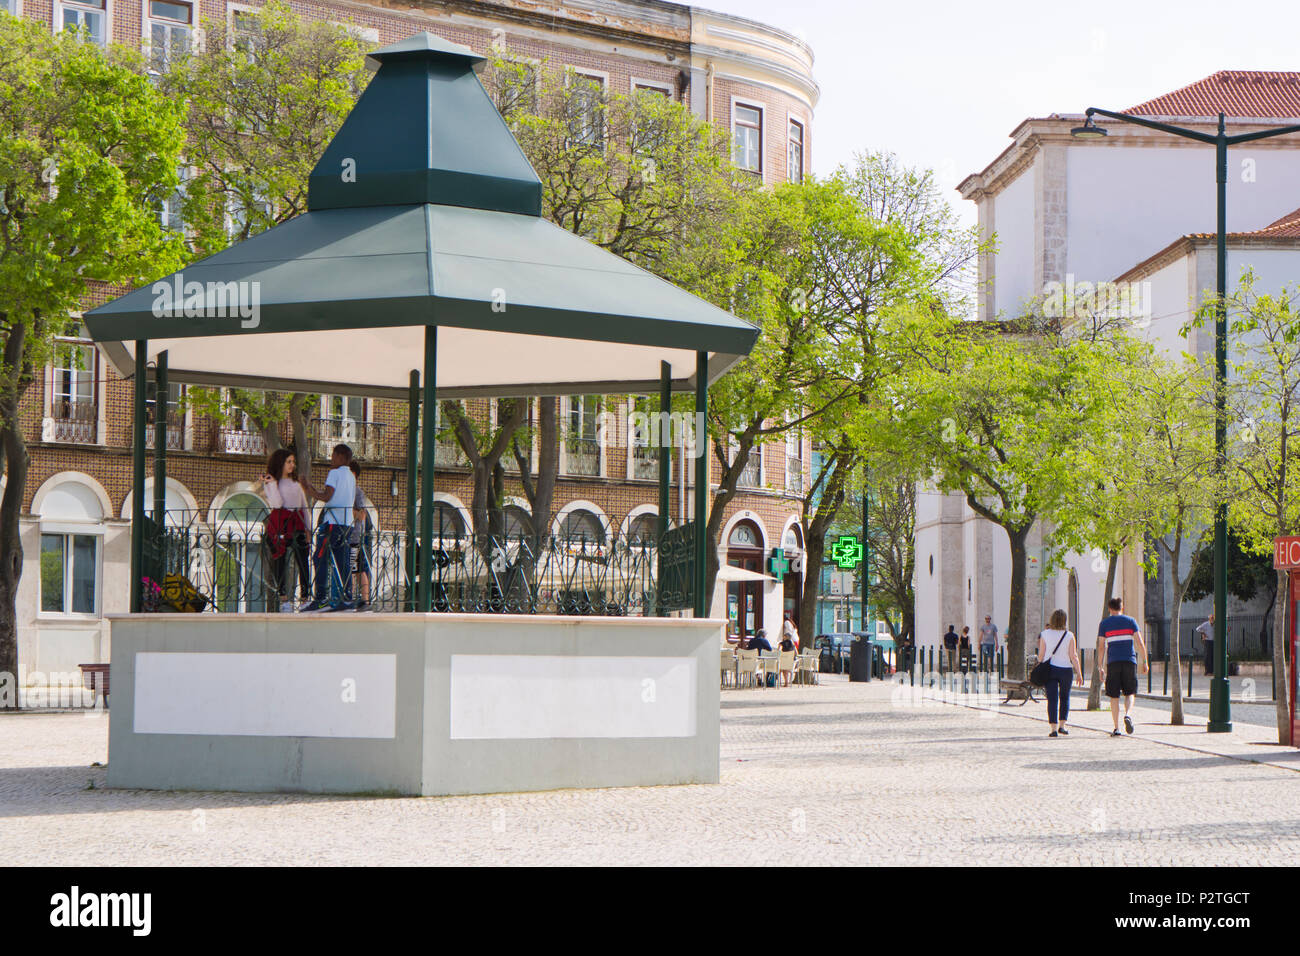 Largo da Graça bandstand, Lisbon, Portugal - Stock Image